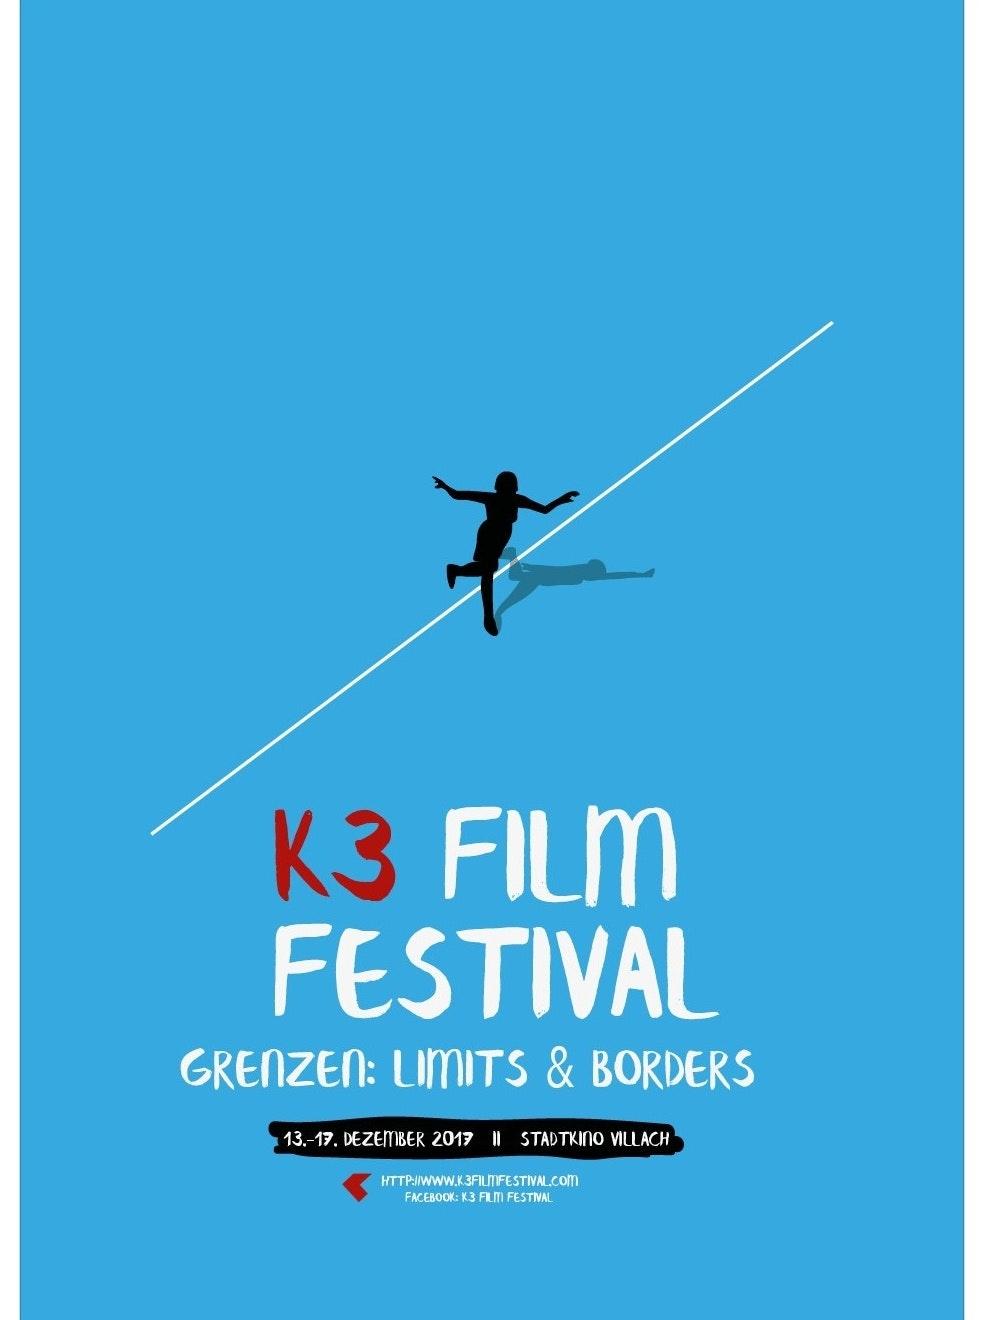 K3 Film Festival poster mockup